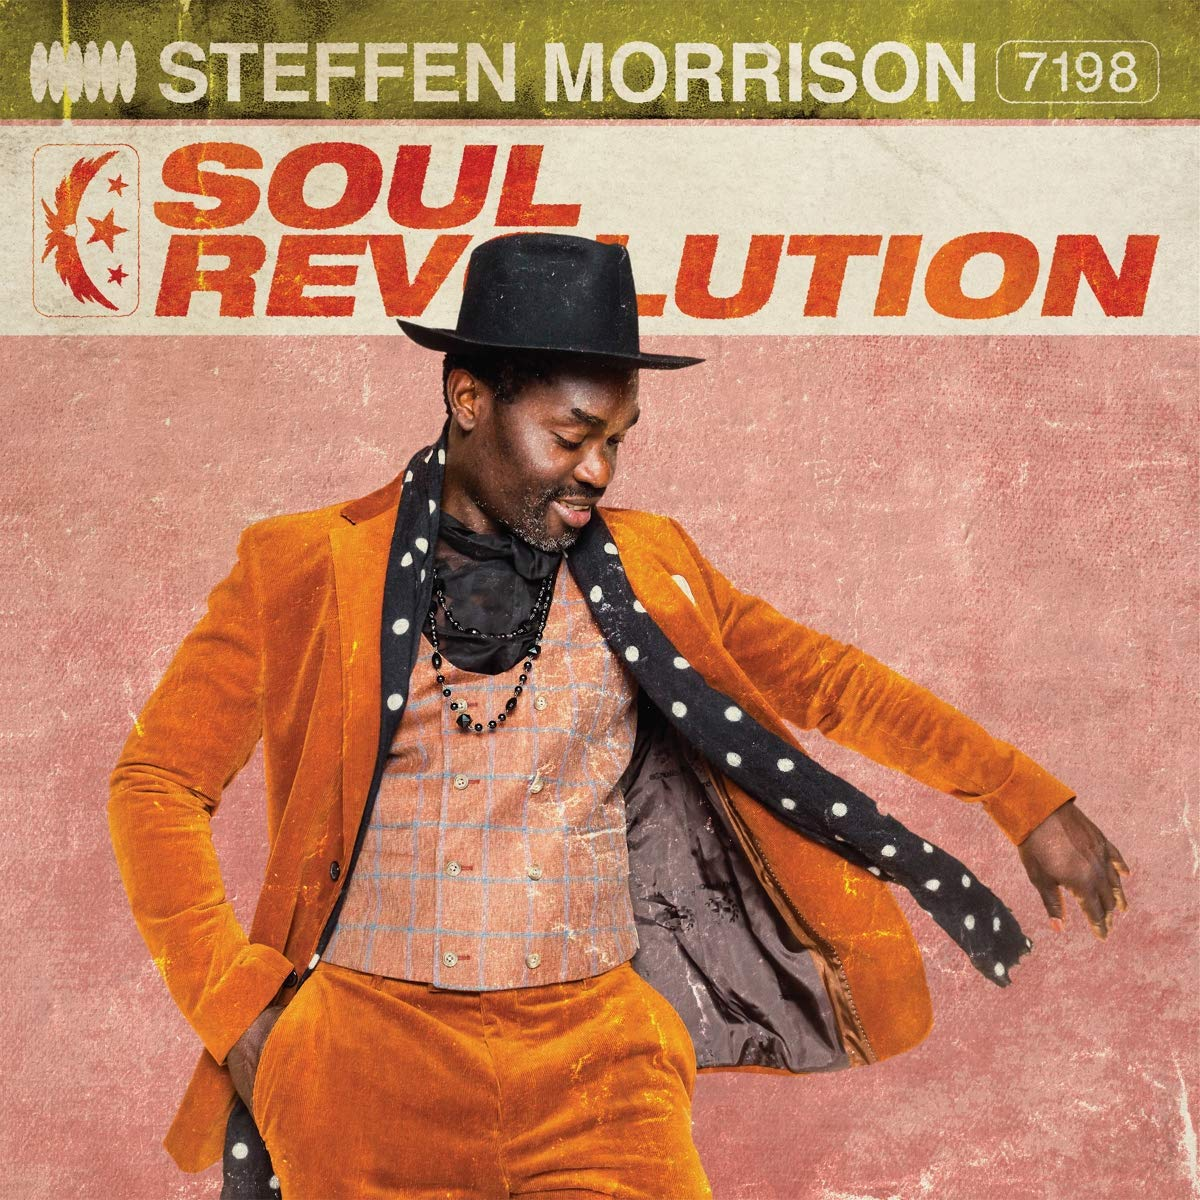 Steffen Morrison - Soul Revolution (2020) [FLAC] Download